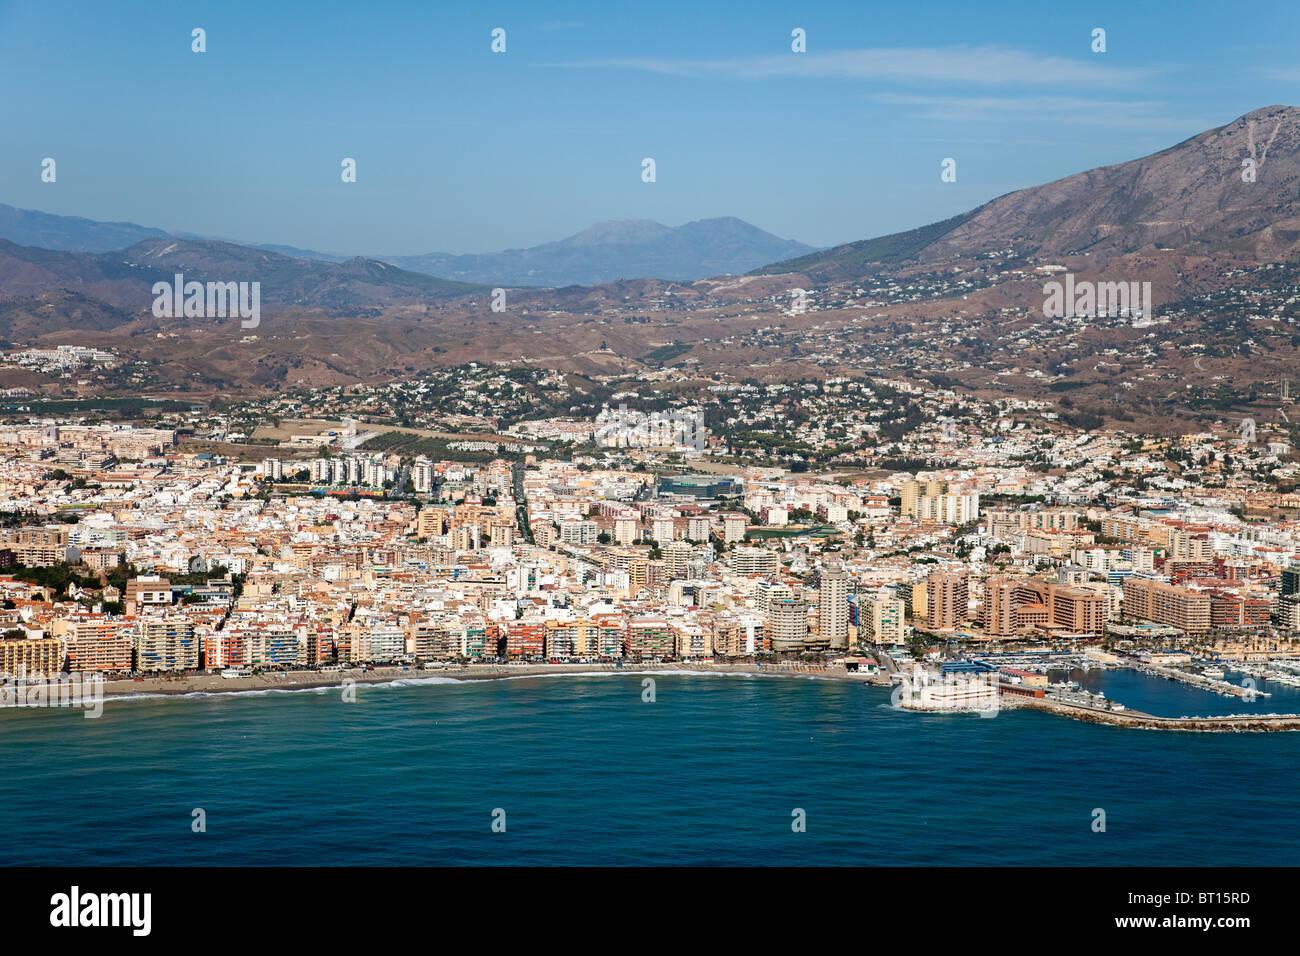 Vista aerea de fuengirola m laga costa del sol andaluc a espa a stock photo royalty free image - Fotografia aerea malaga ...